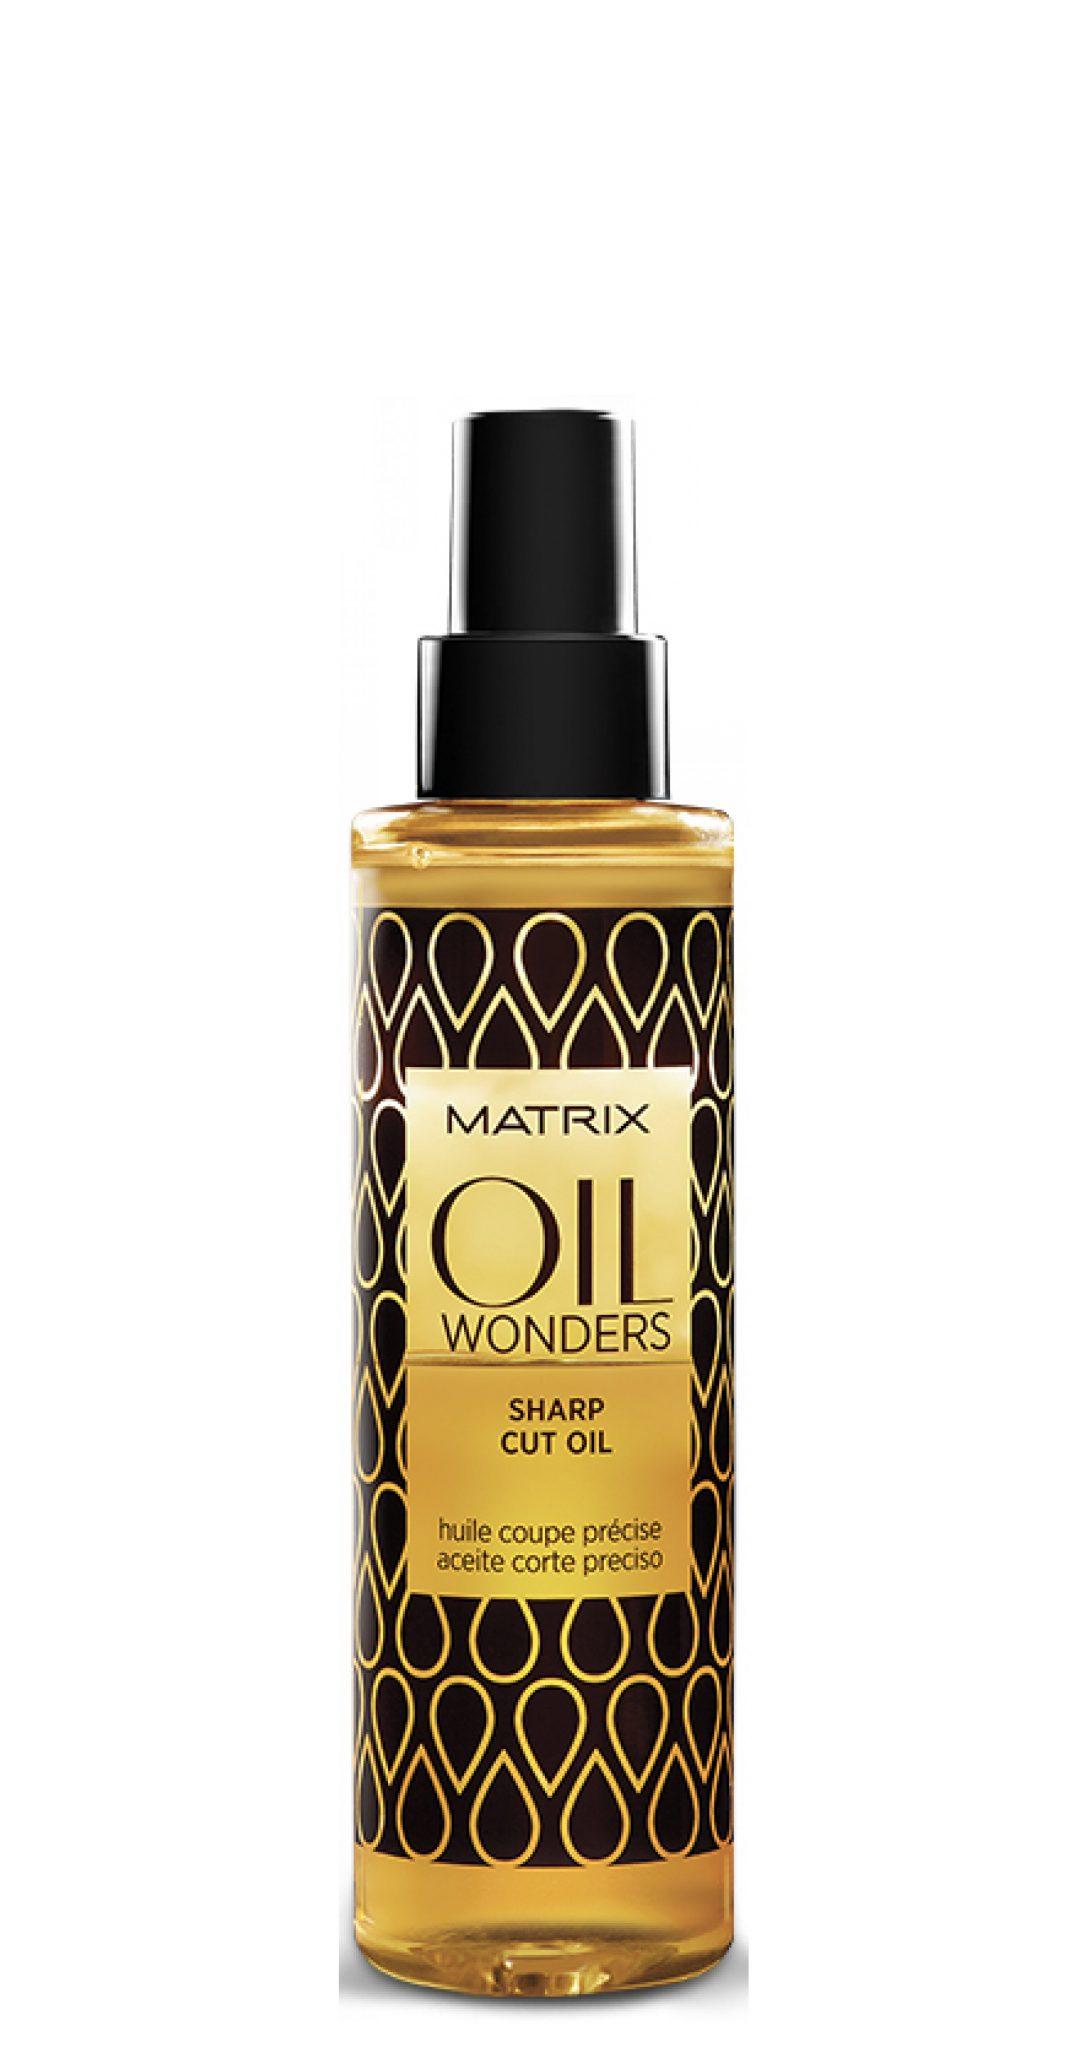 Aliejukas plaukams Matrix OIL Wonders SHARP CUT OIL purškiamas 125ml-0